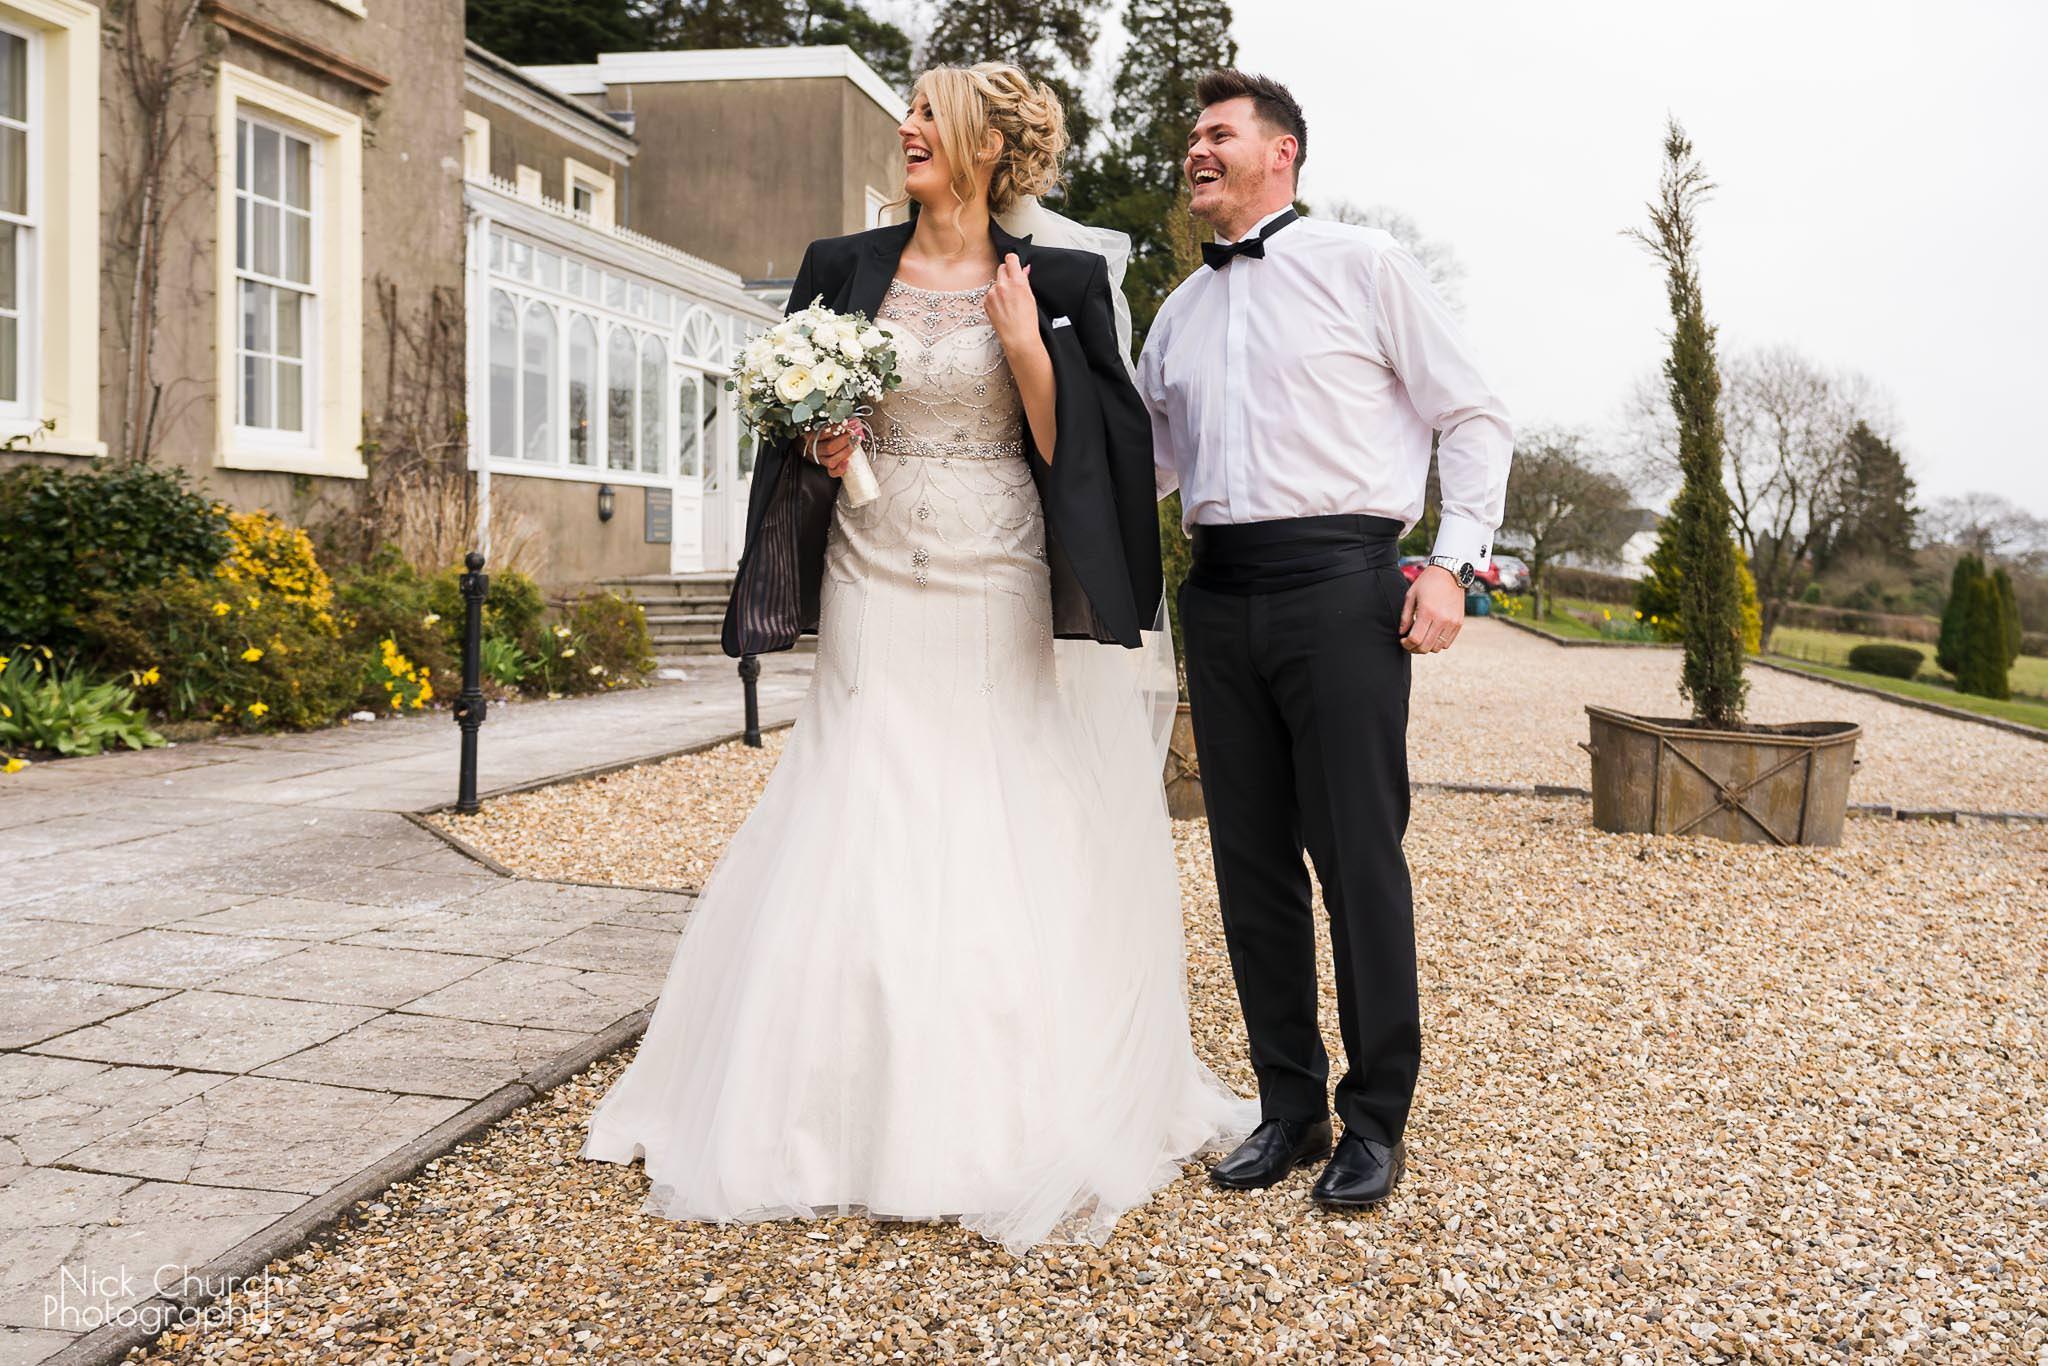 NC-20180317-stacy-and-mike-wedding-0927.jpg